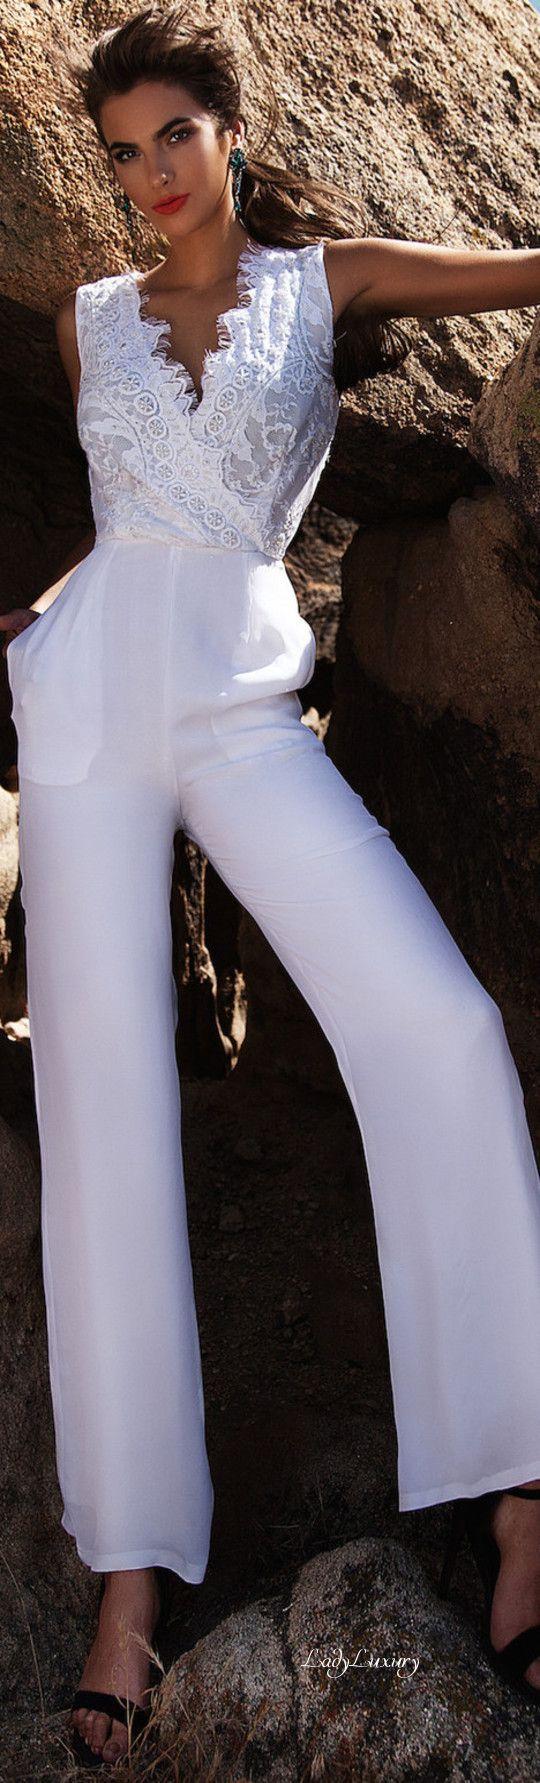 Lurelly Paris Jumpsuit | LadyLuxuryDesigns